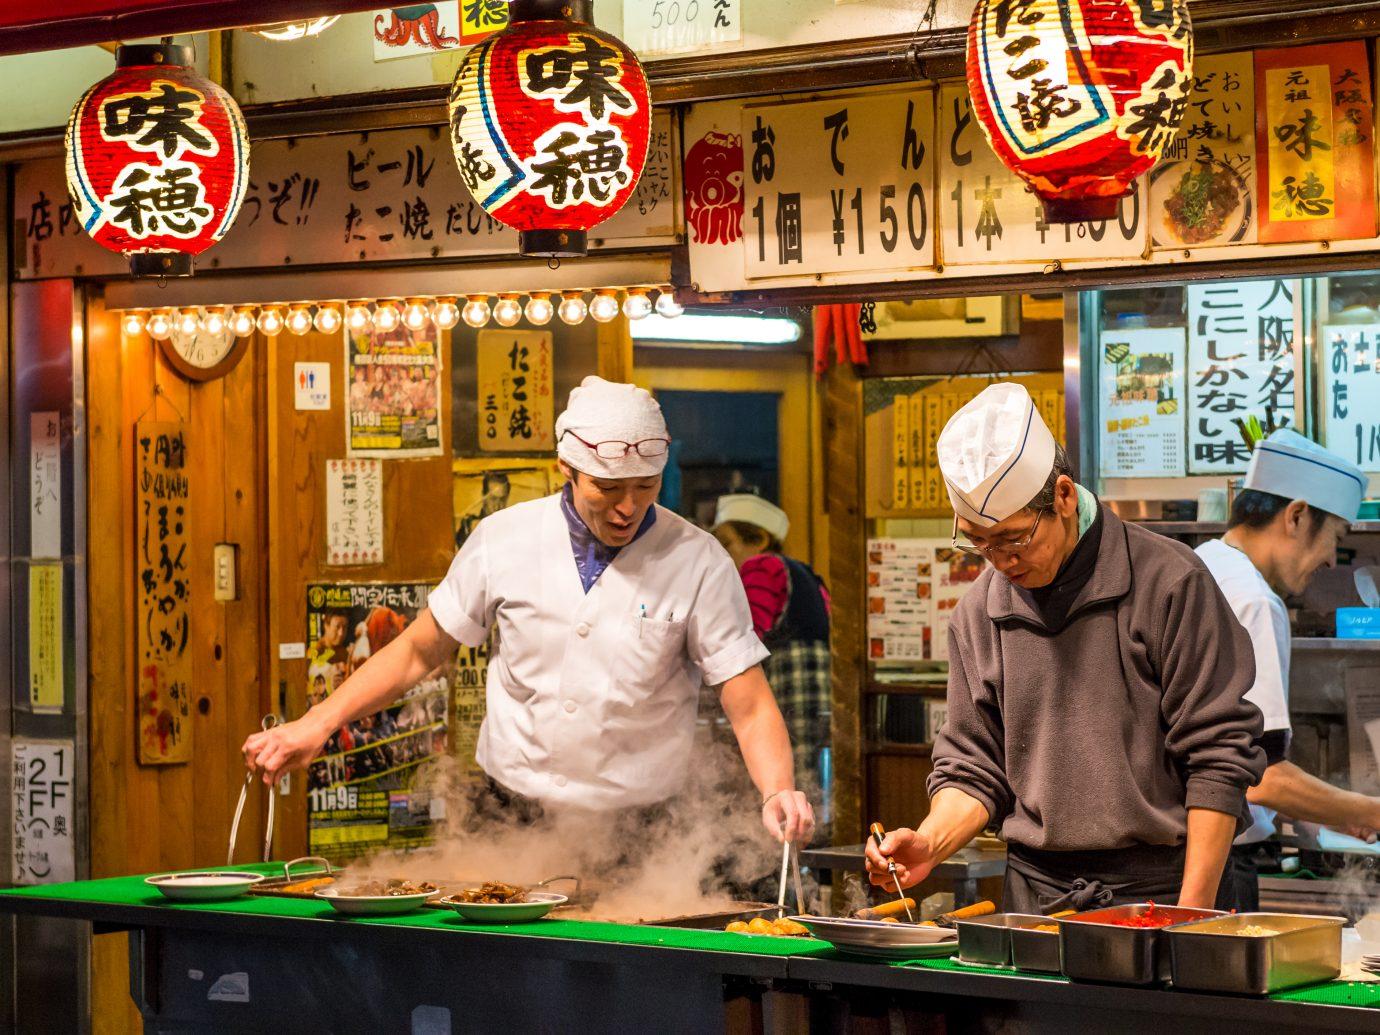 traditional Japanese street food in Osaka